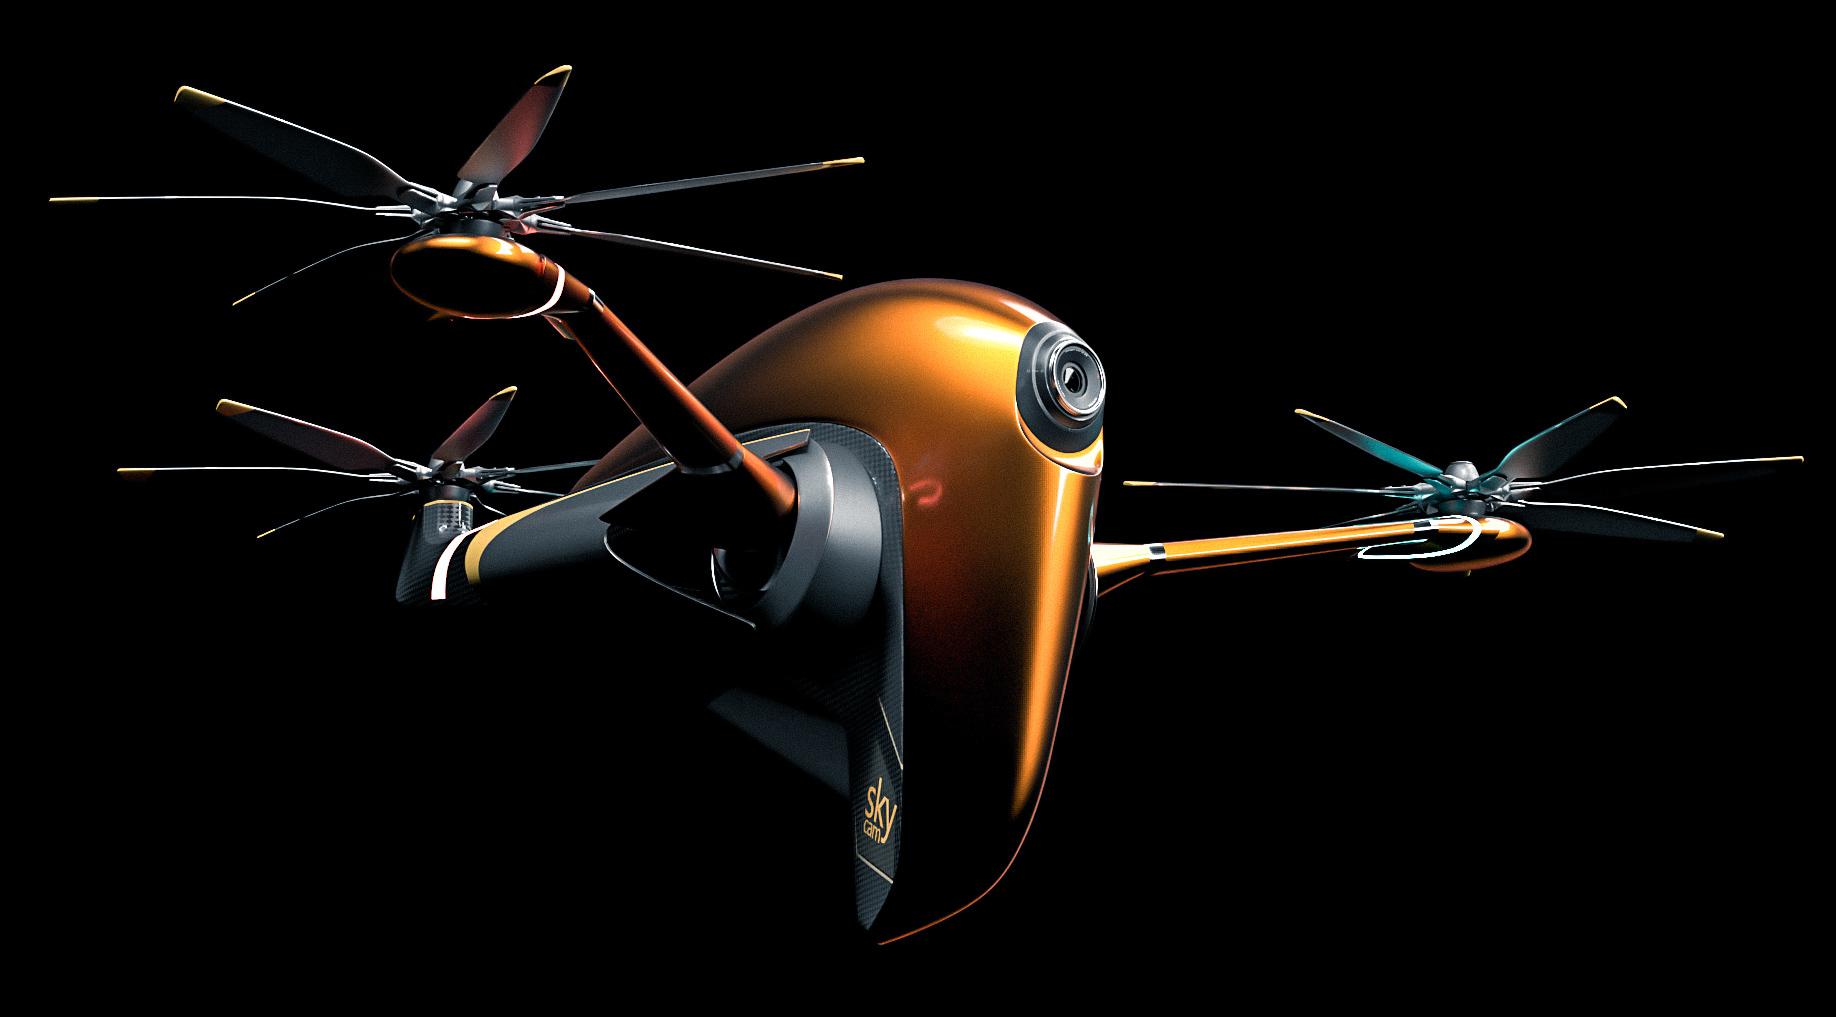 UAV Concept on